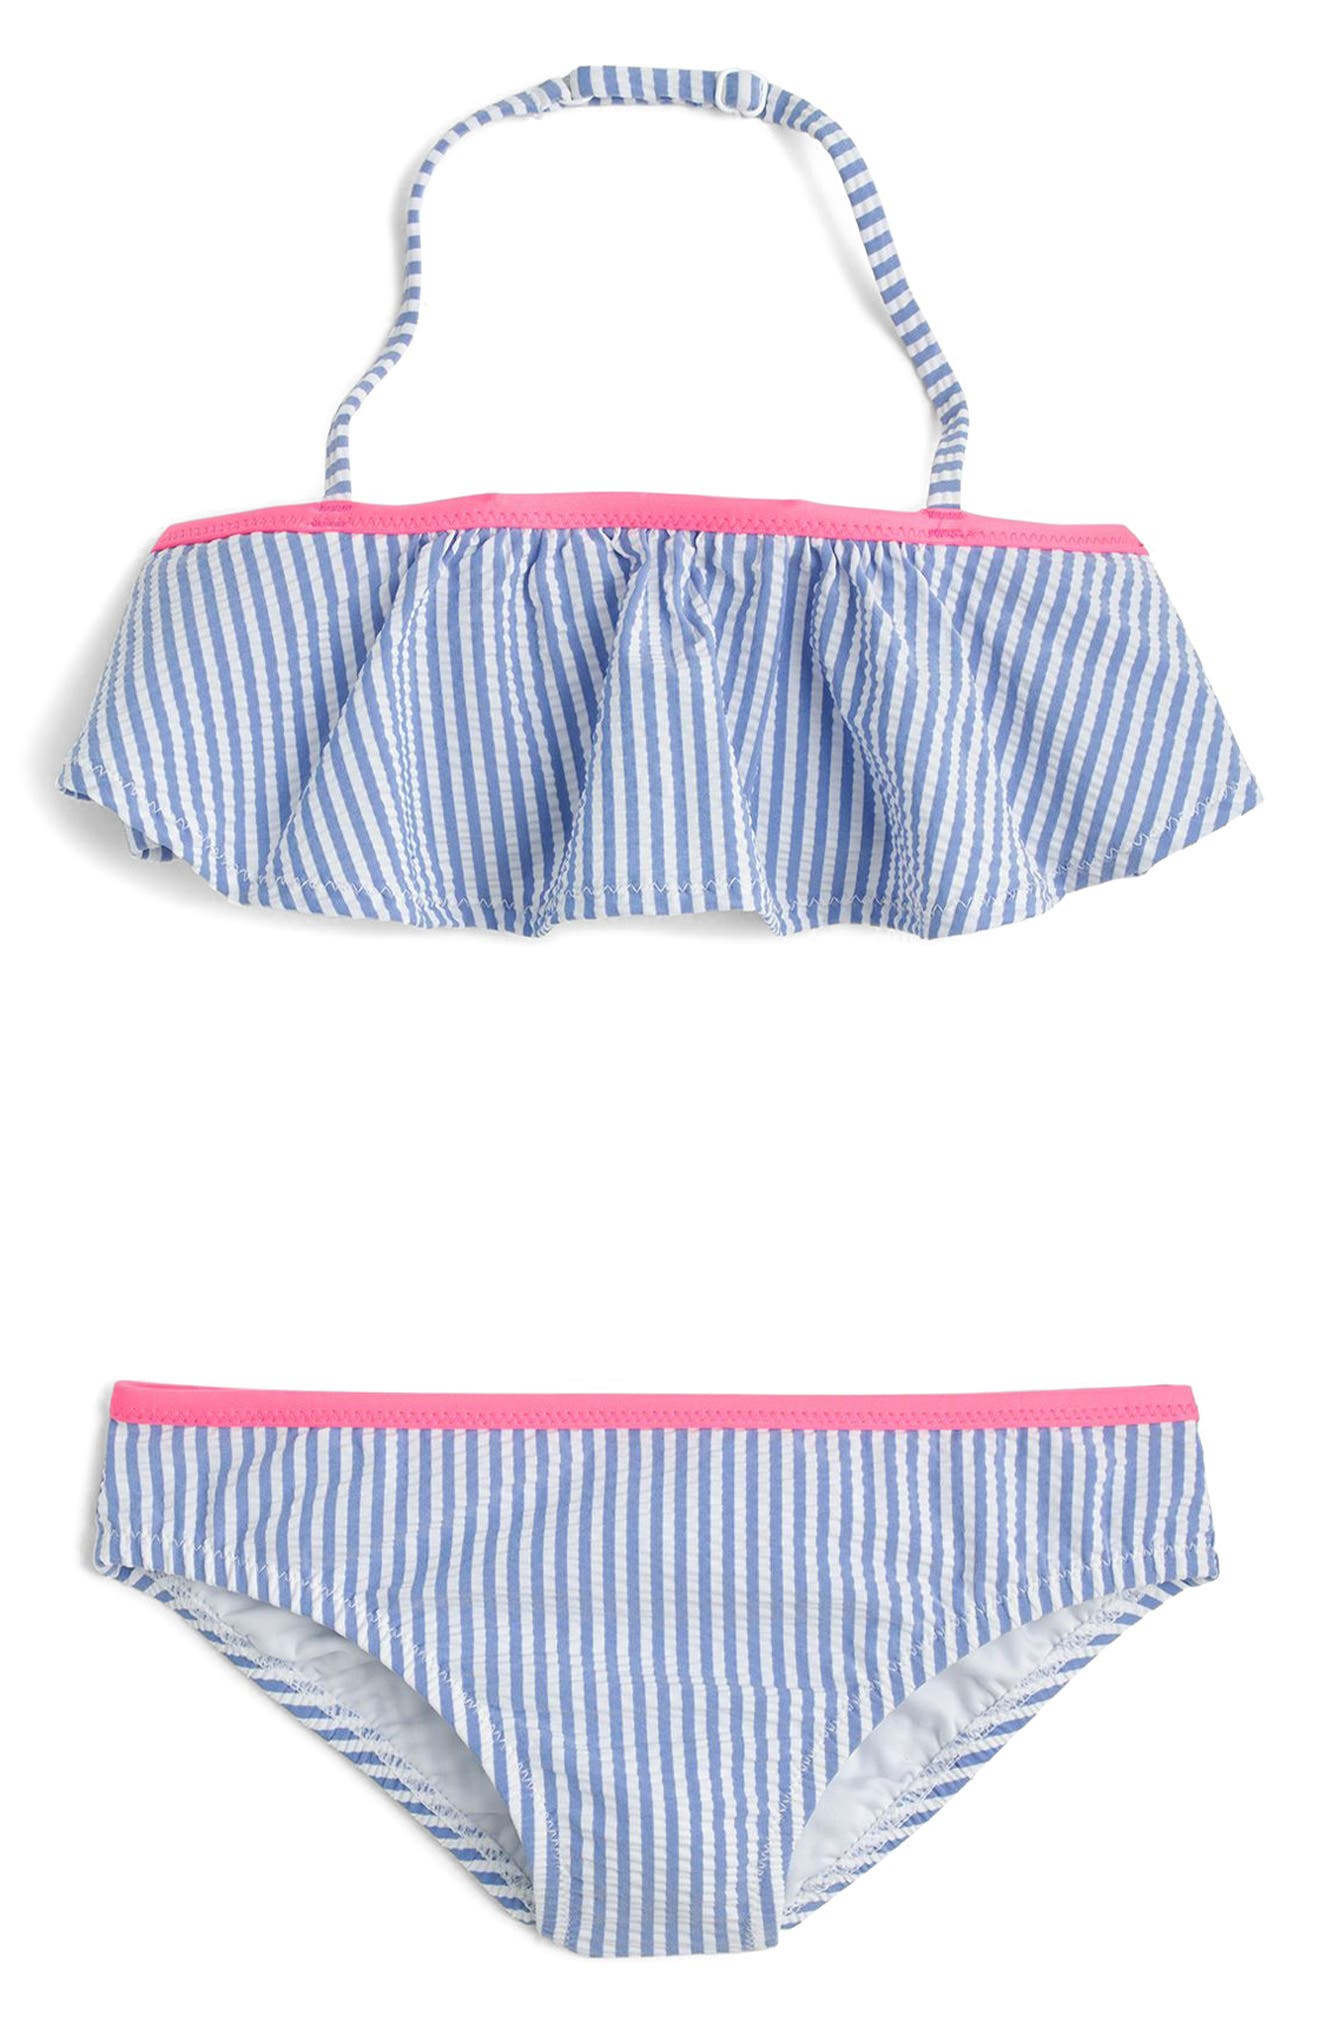 Ruffled Seersucker Two-Piece Bikini Swimsuit,                             Main thumbnail 1, color,                             Blue Pink Multi